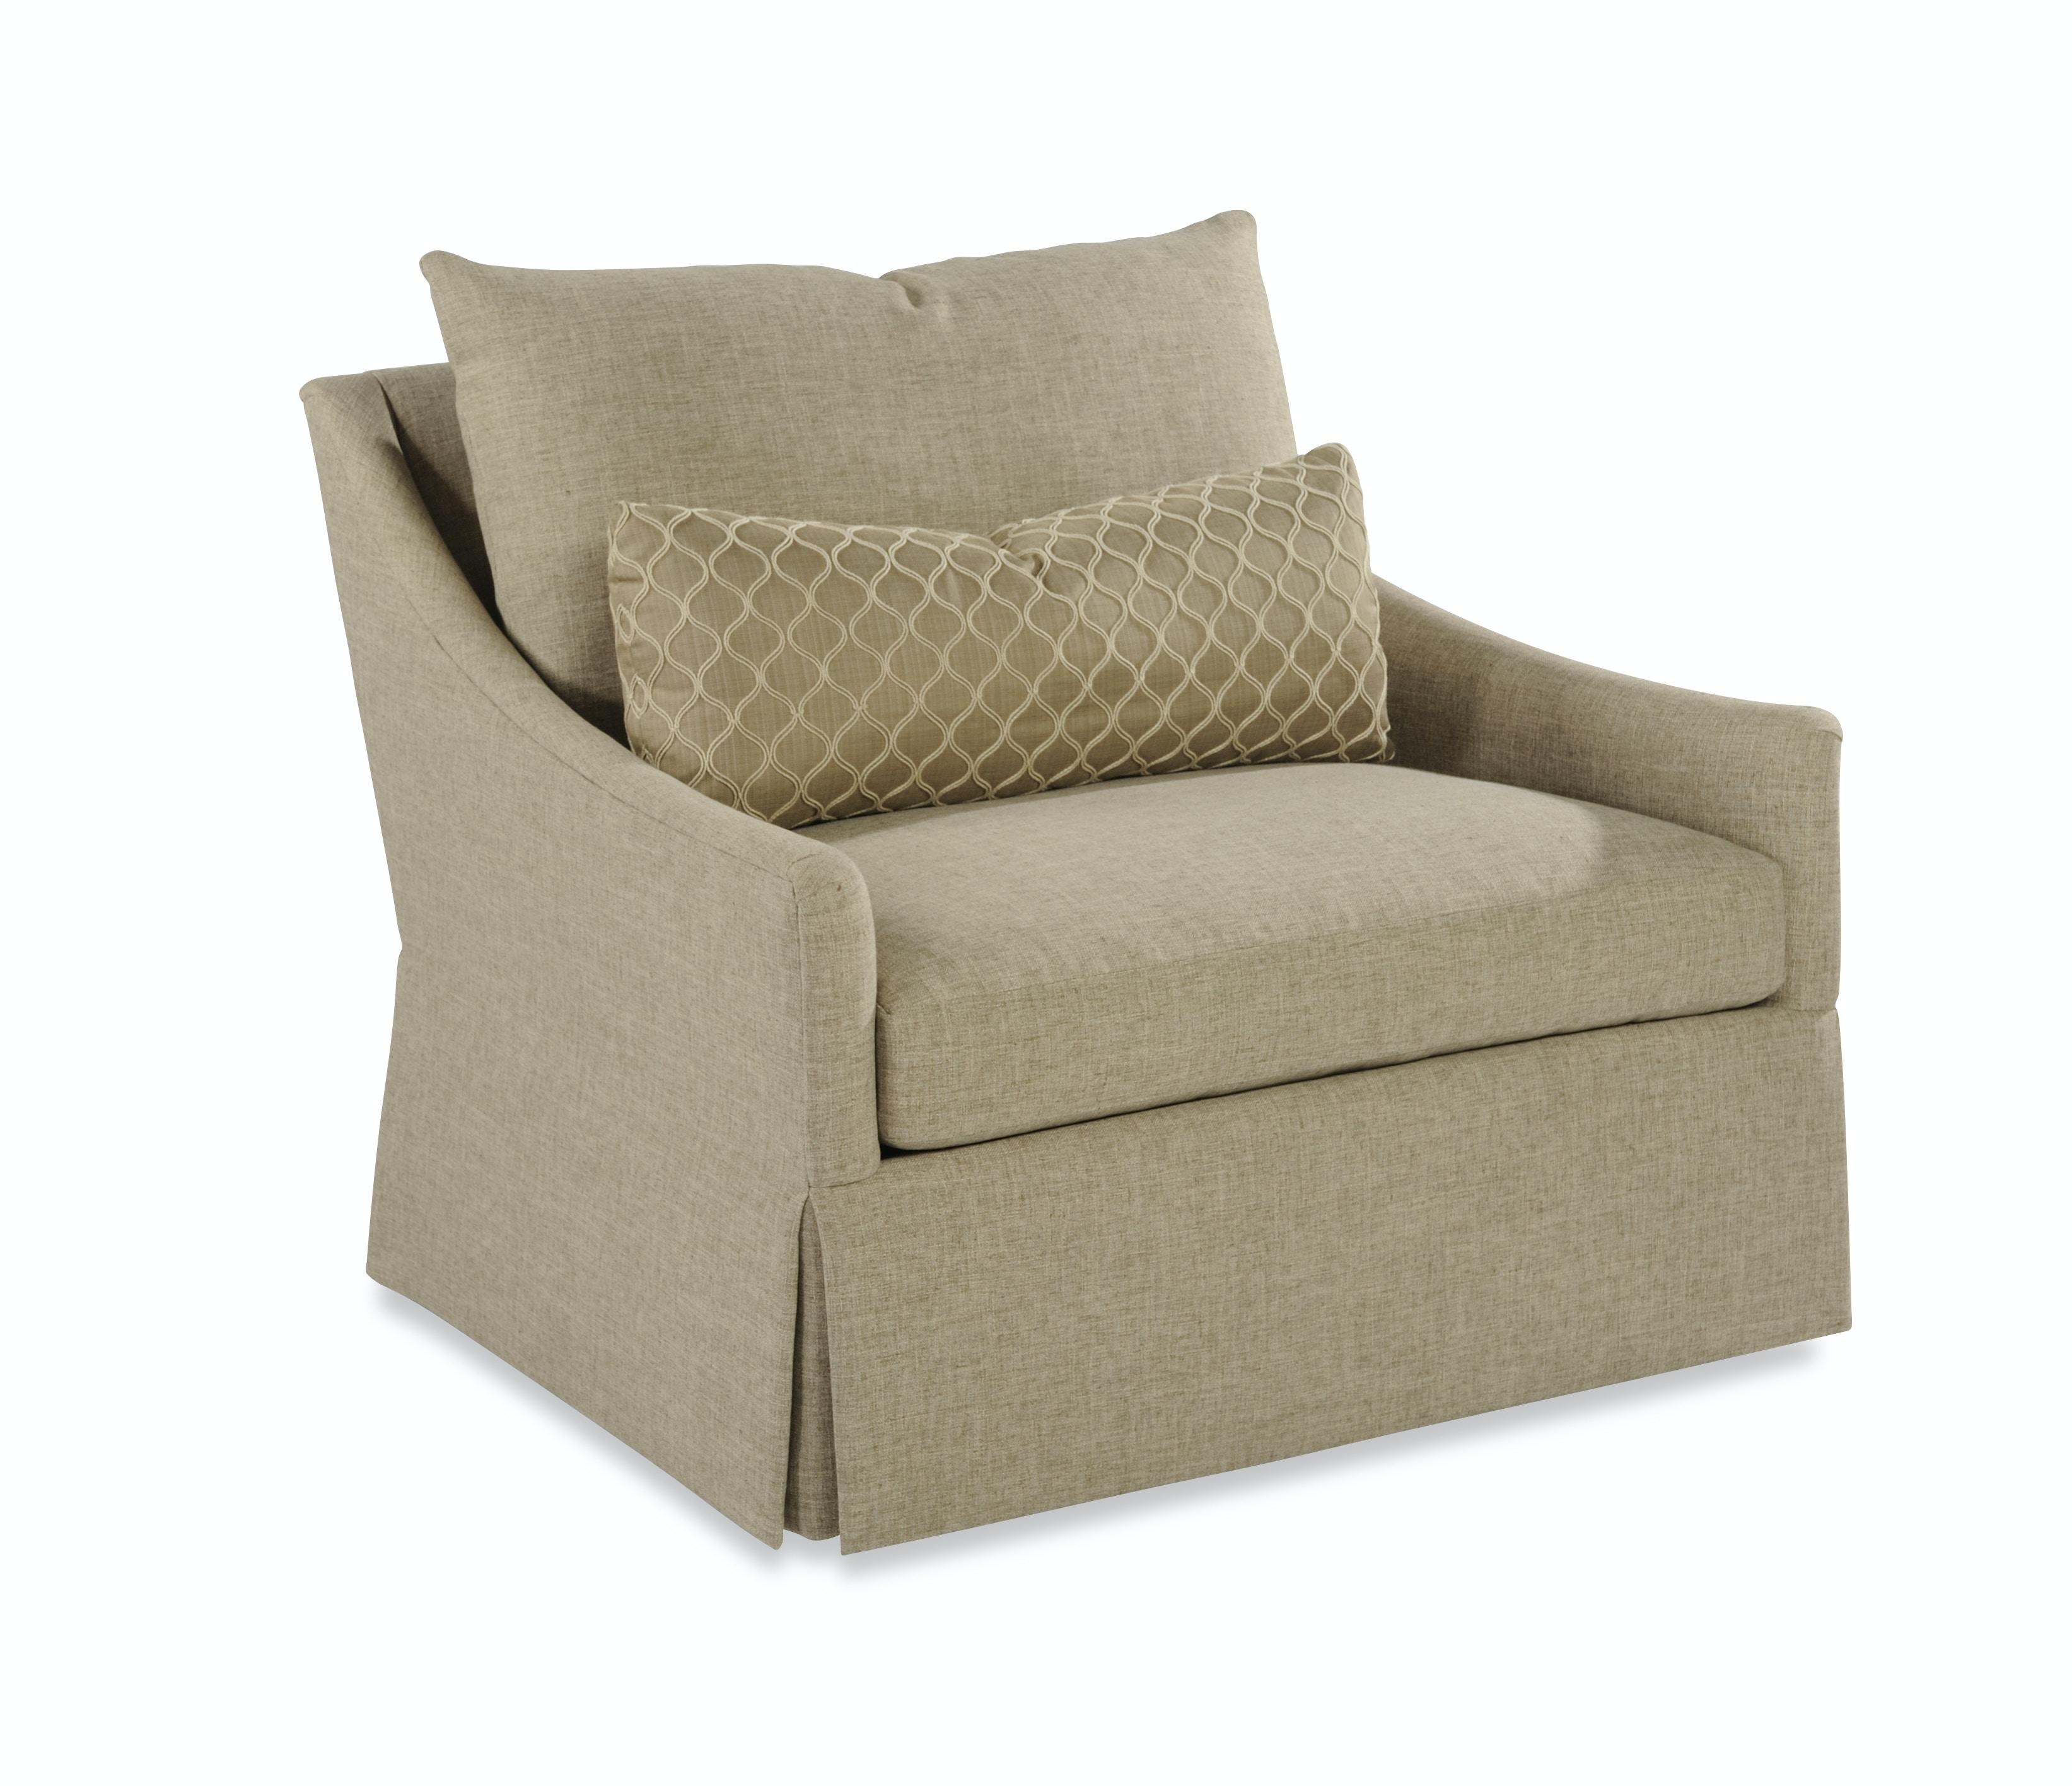 Taylor King Furniture Dawson Chair U0026 Half 7315 01